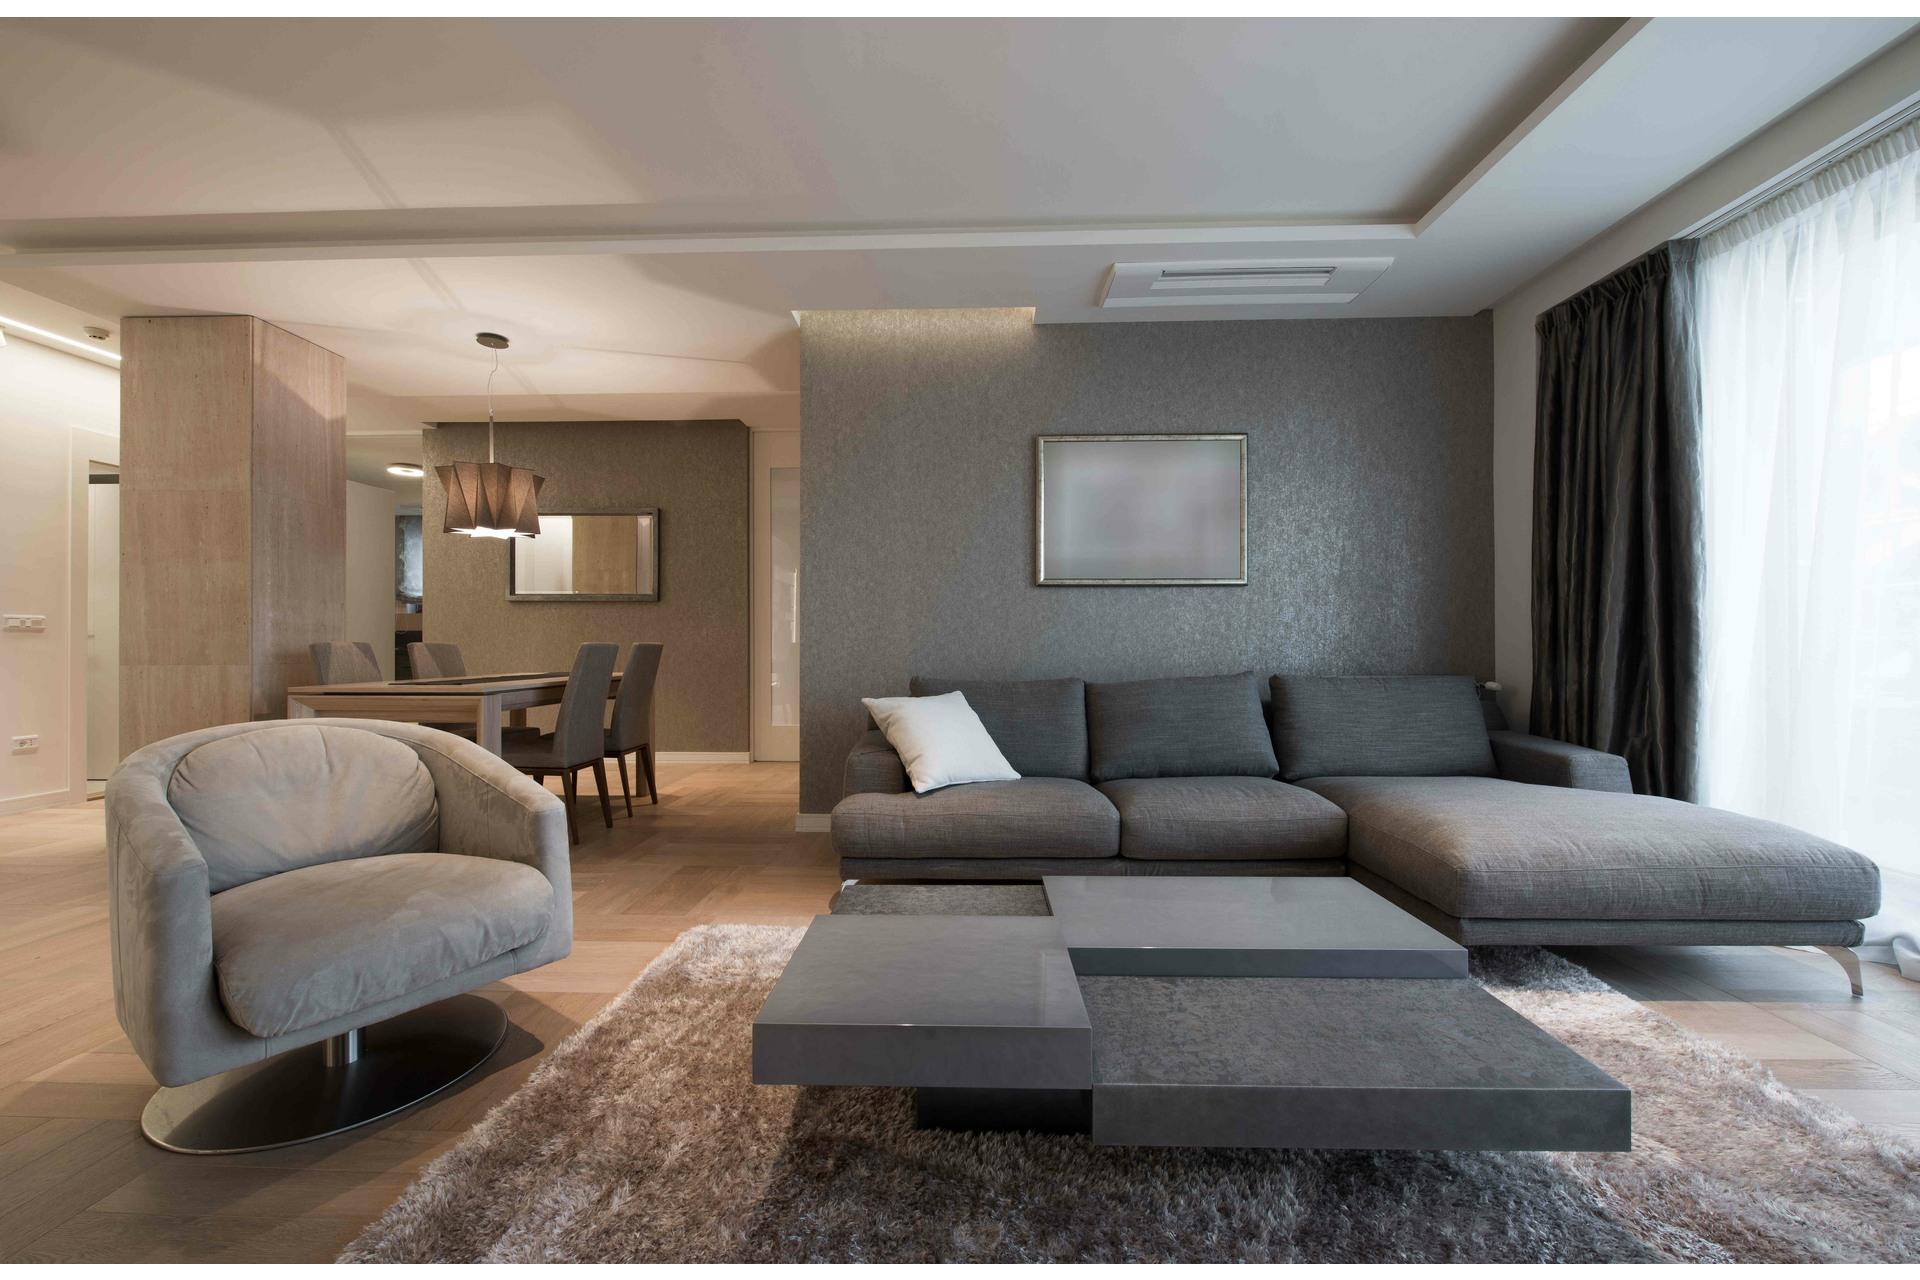 image 0 - 公寓 出售 Montréal Verdun - 6 室